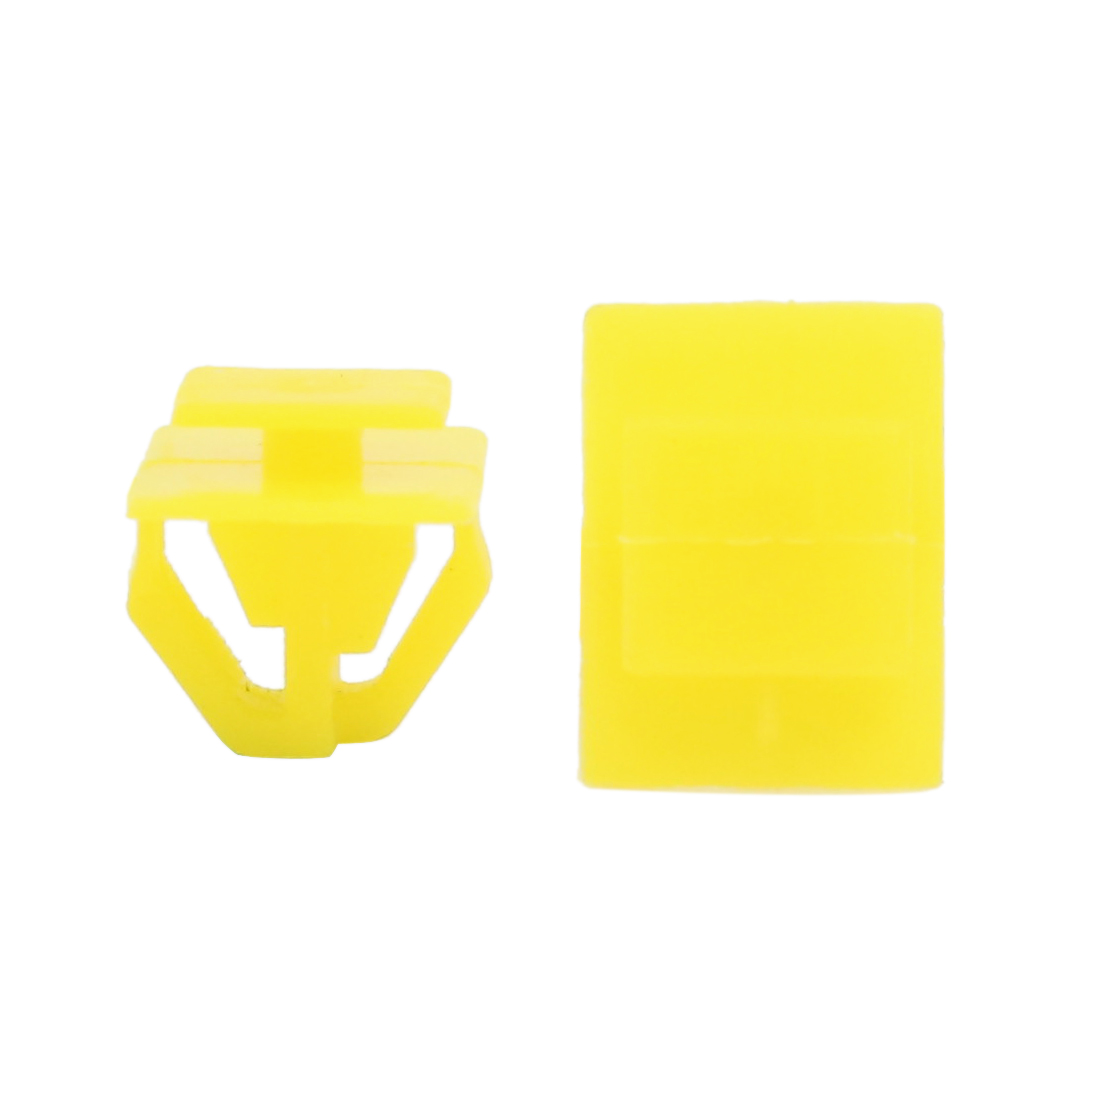 50Pcs 14mm Hole Yellow Car Plastic Trim Door Panel Retainer Clips Rivet Fastener